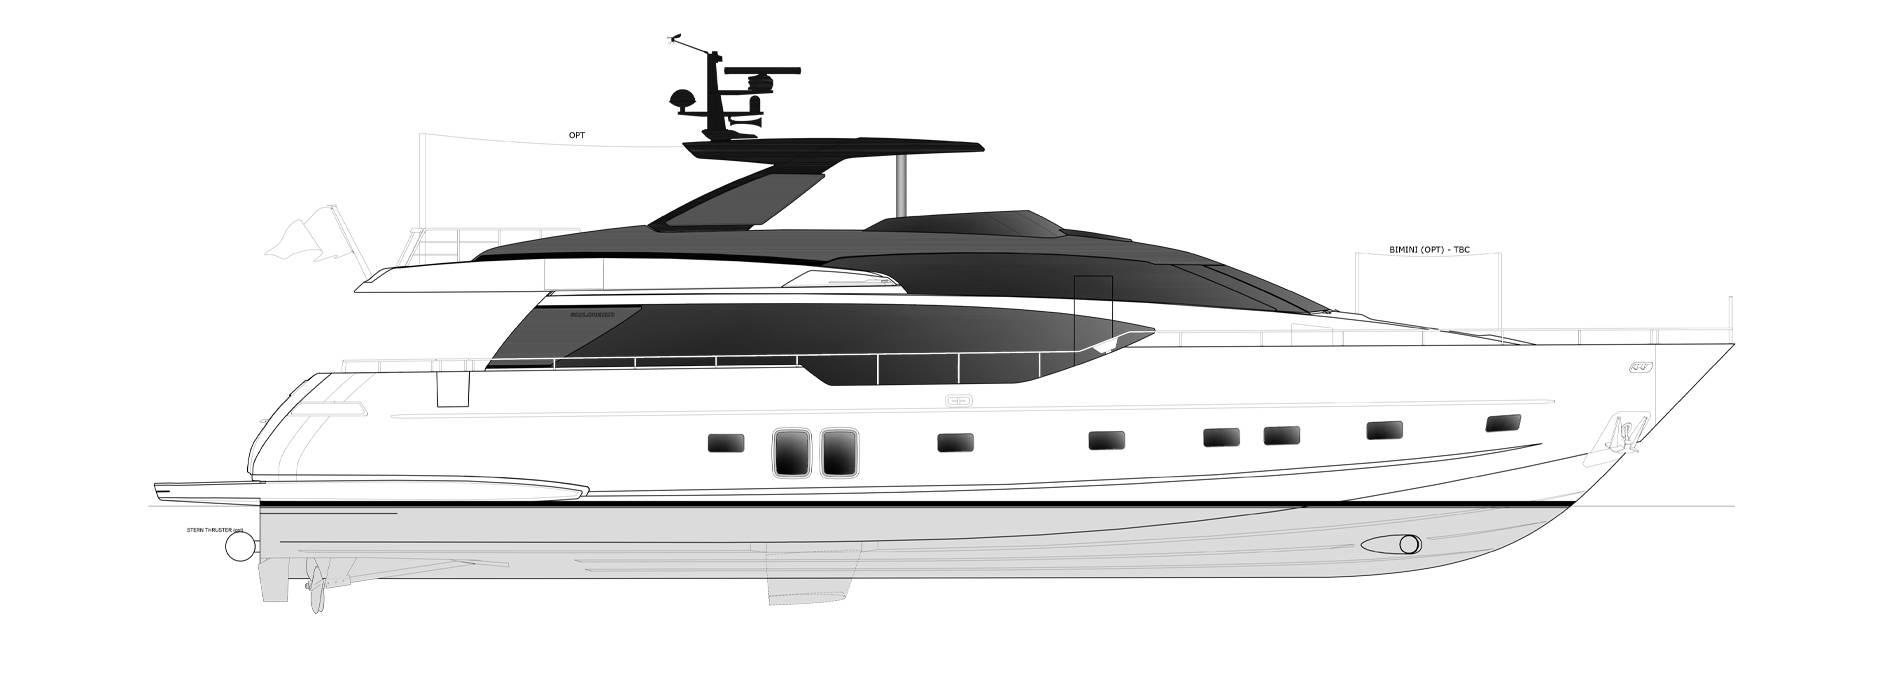 Sanlorenzo Yachts SL86-727 Профиль